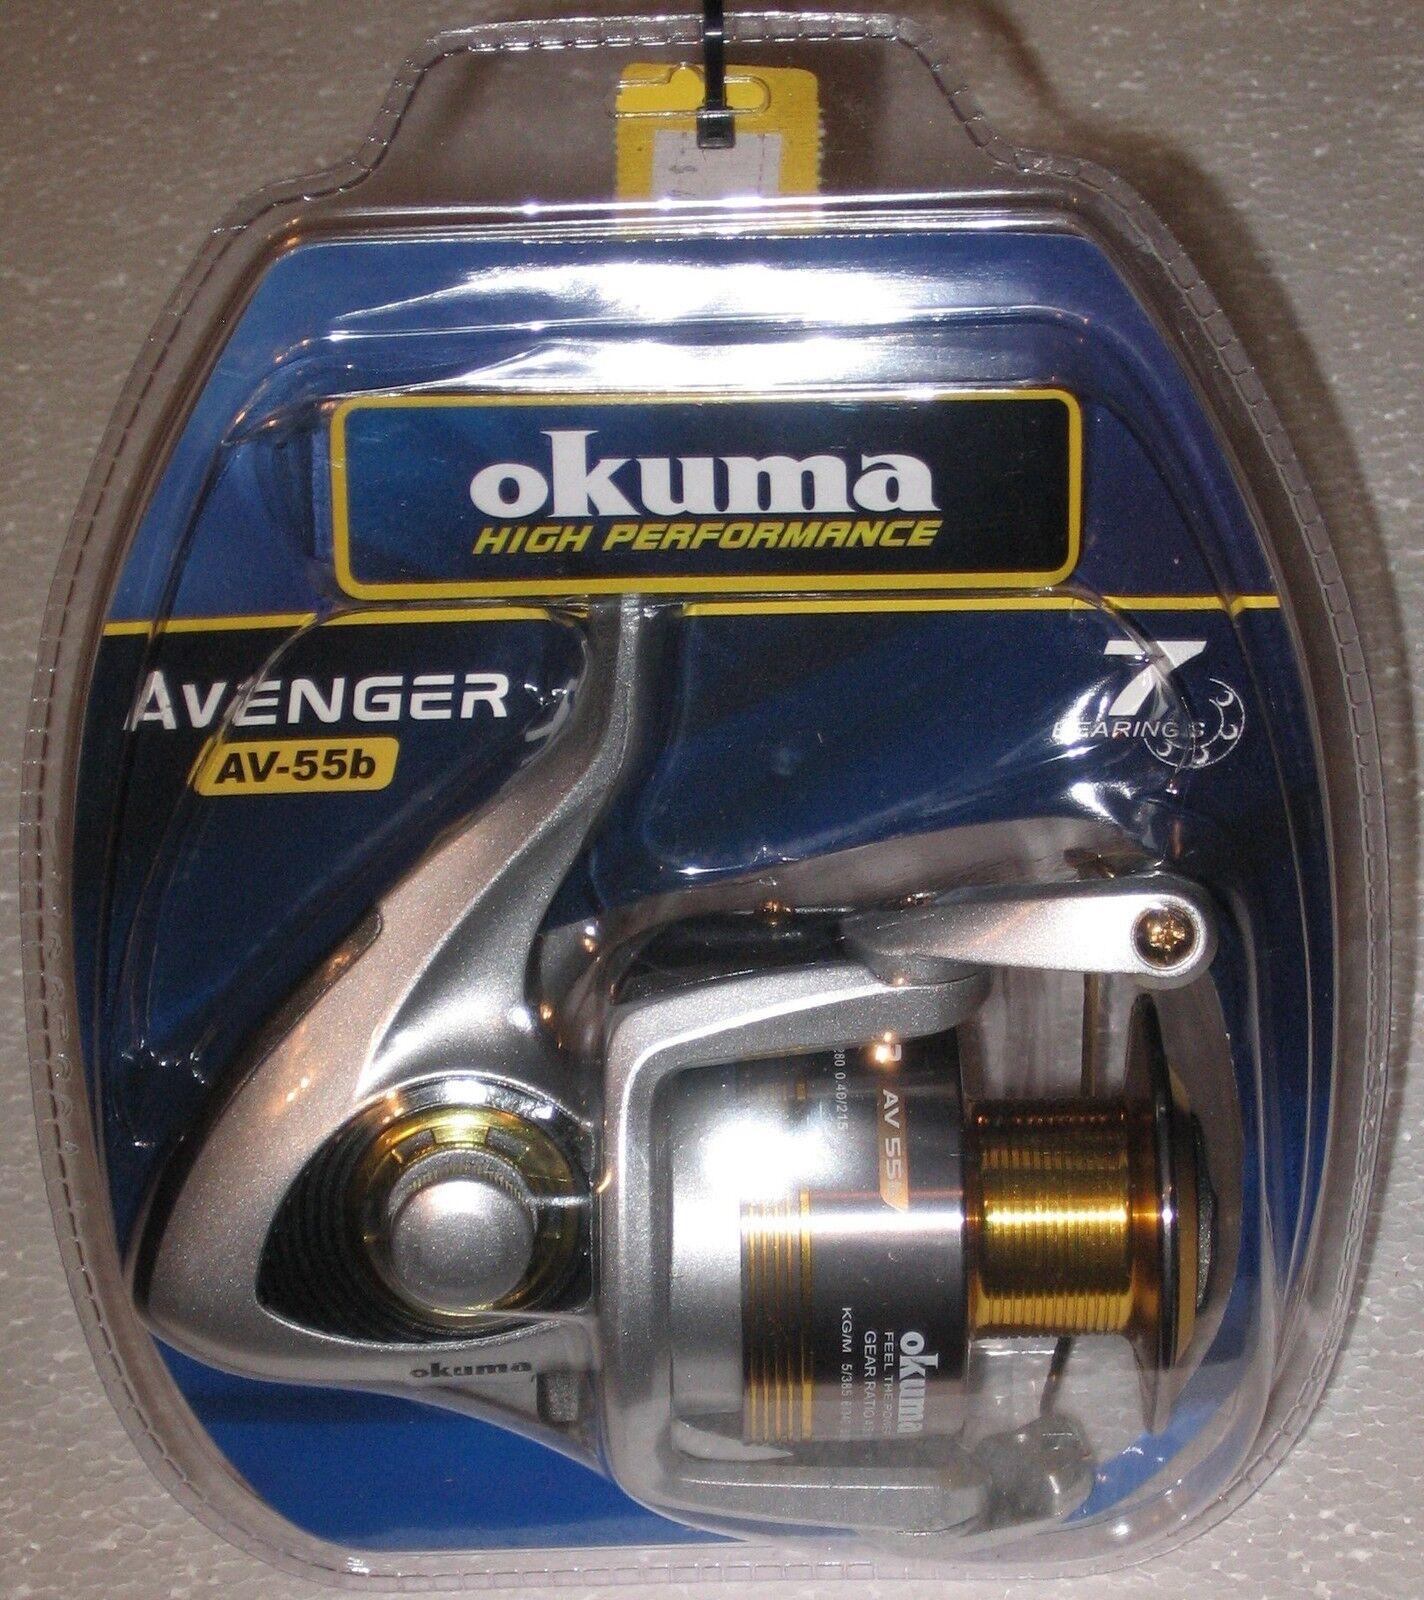 Okuma Avenger AV-55B-CL AV-55B-CL AV-55B-CL Spinning Reel 9620cf